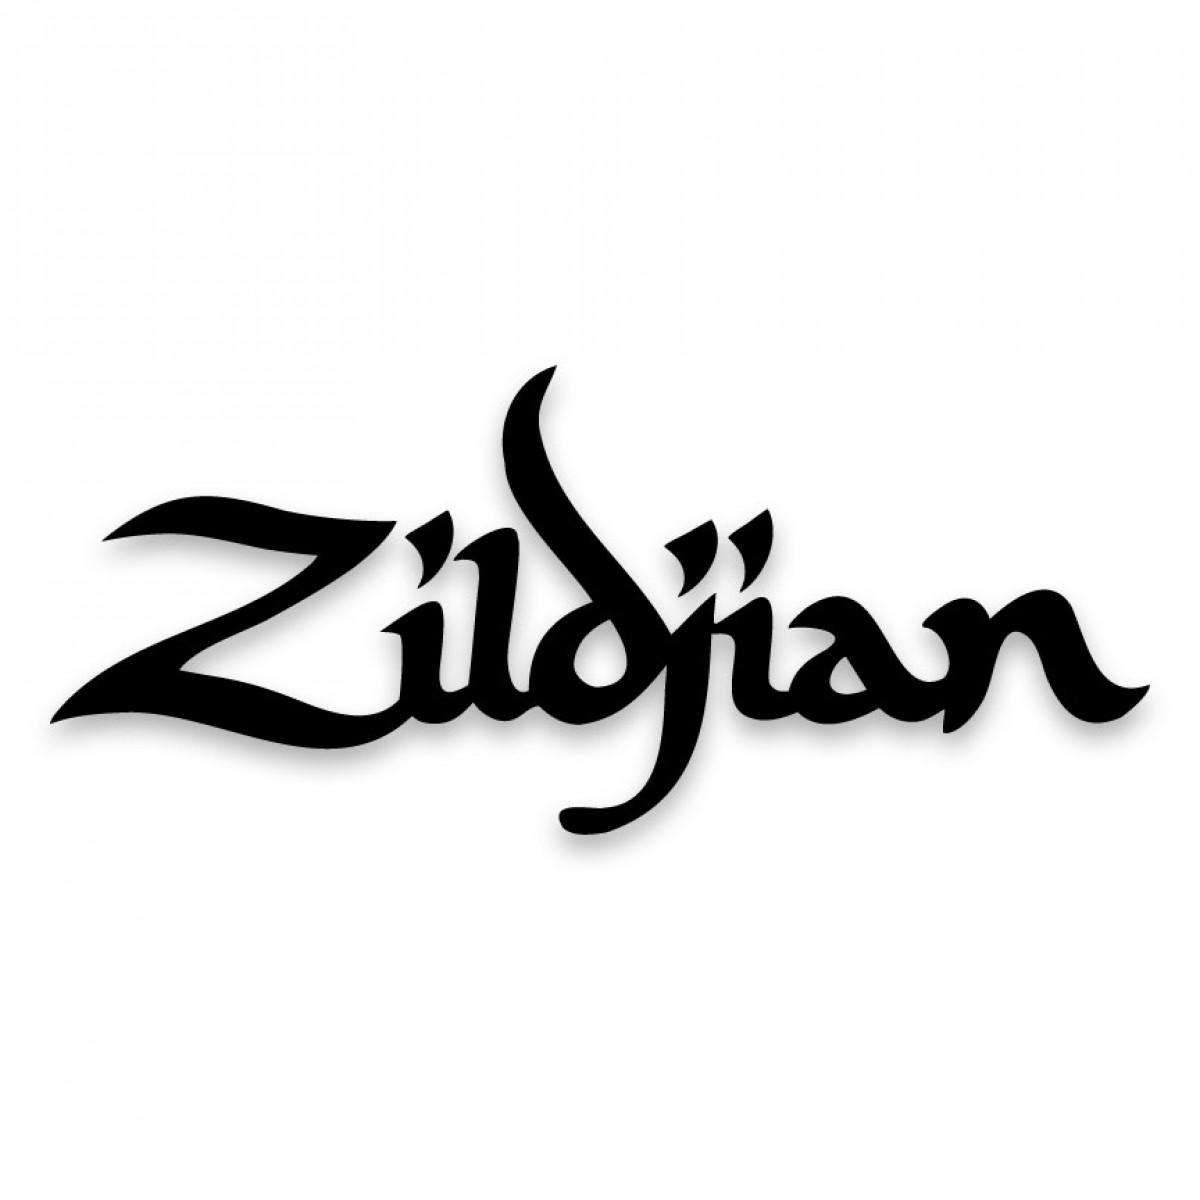 New Zildjian Endorsers